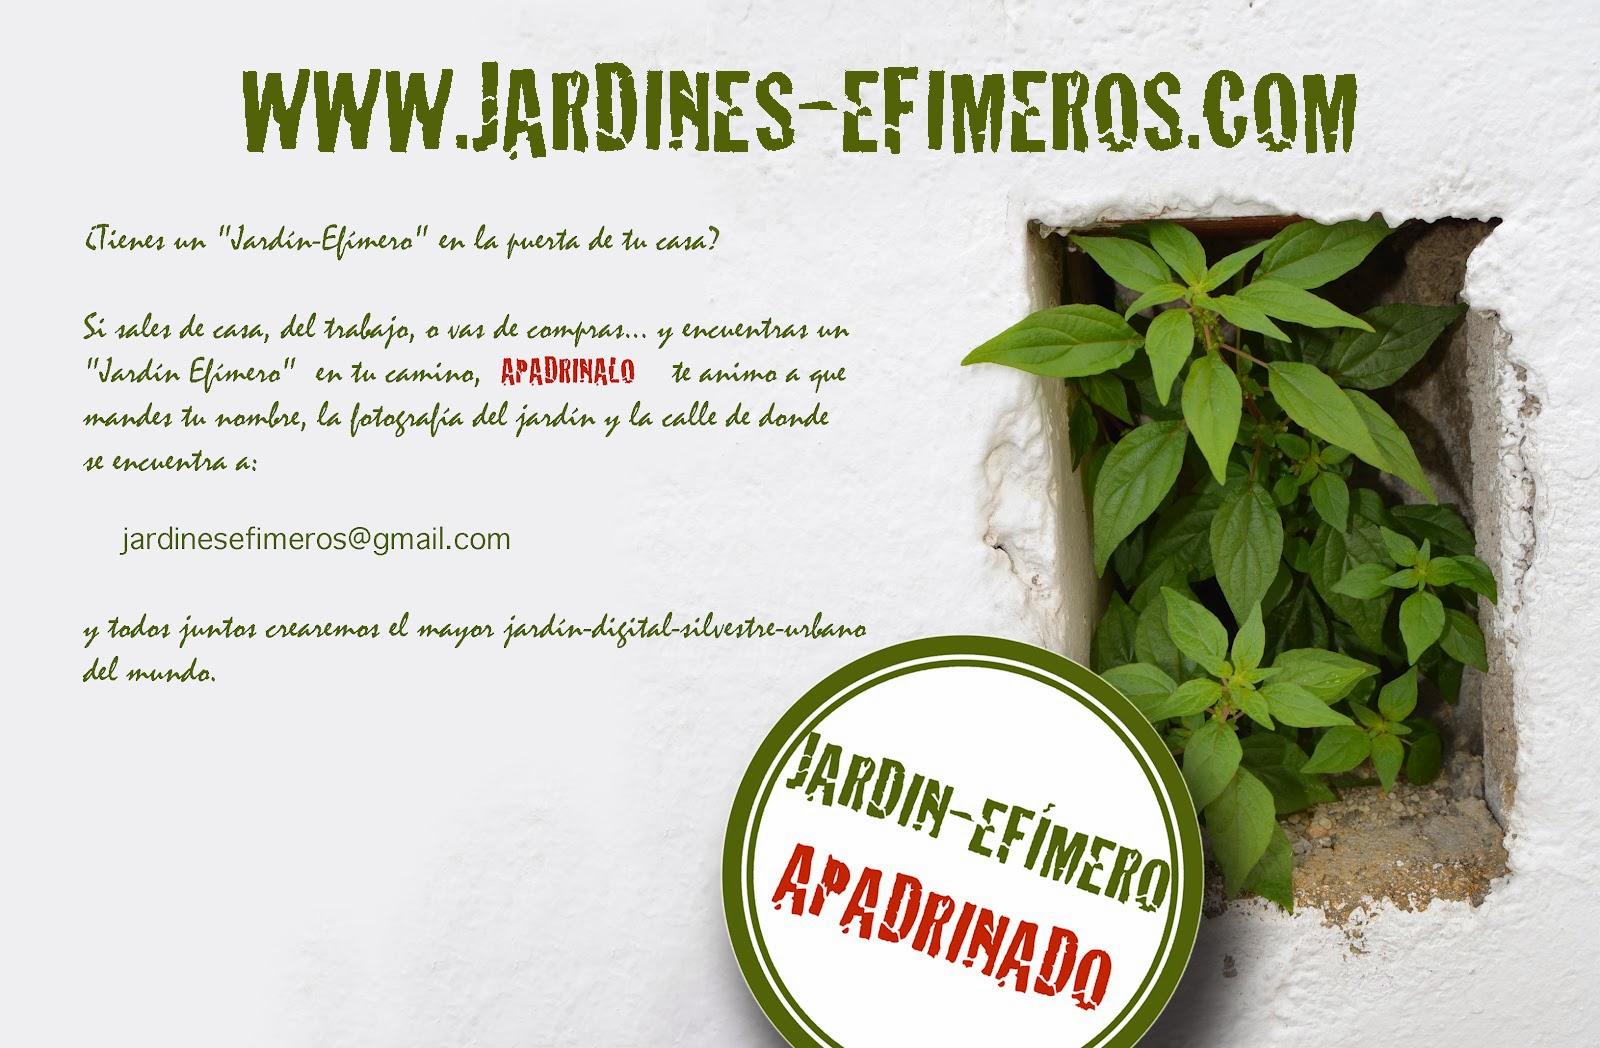 www.jardines-efimeros.com